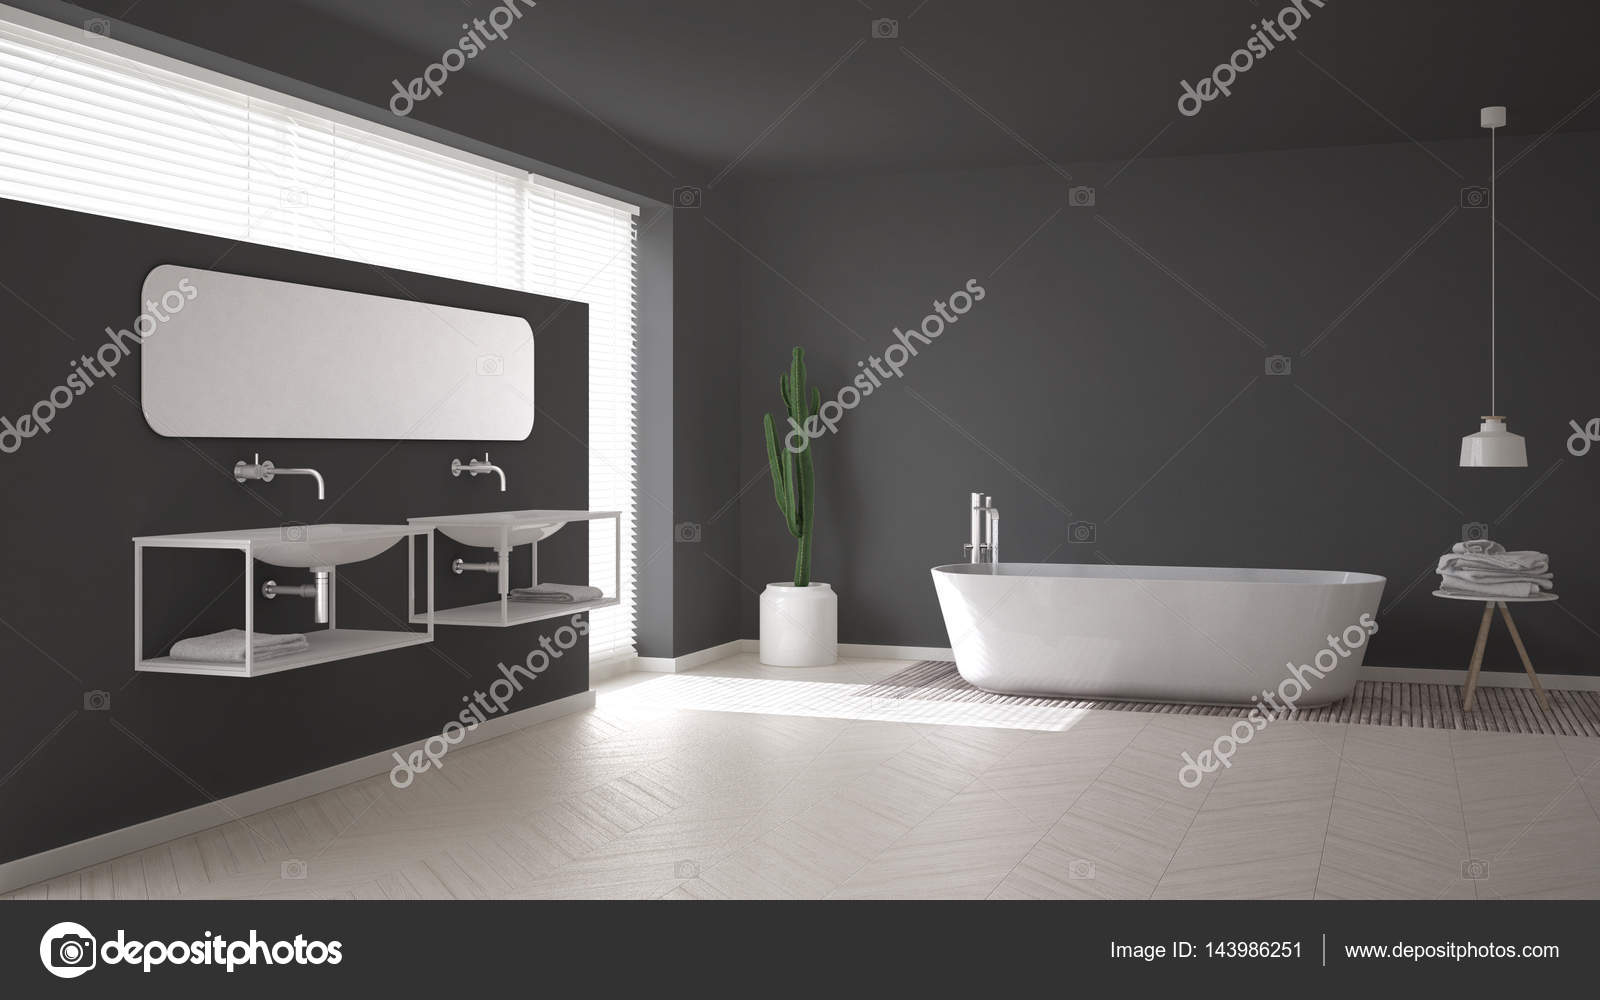 Casa de banho escandinava branco e cinza desi interior for Casa minimalista interior